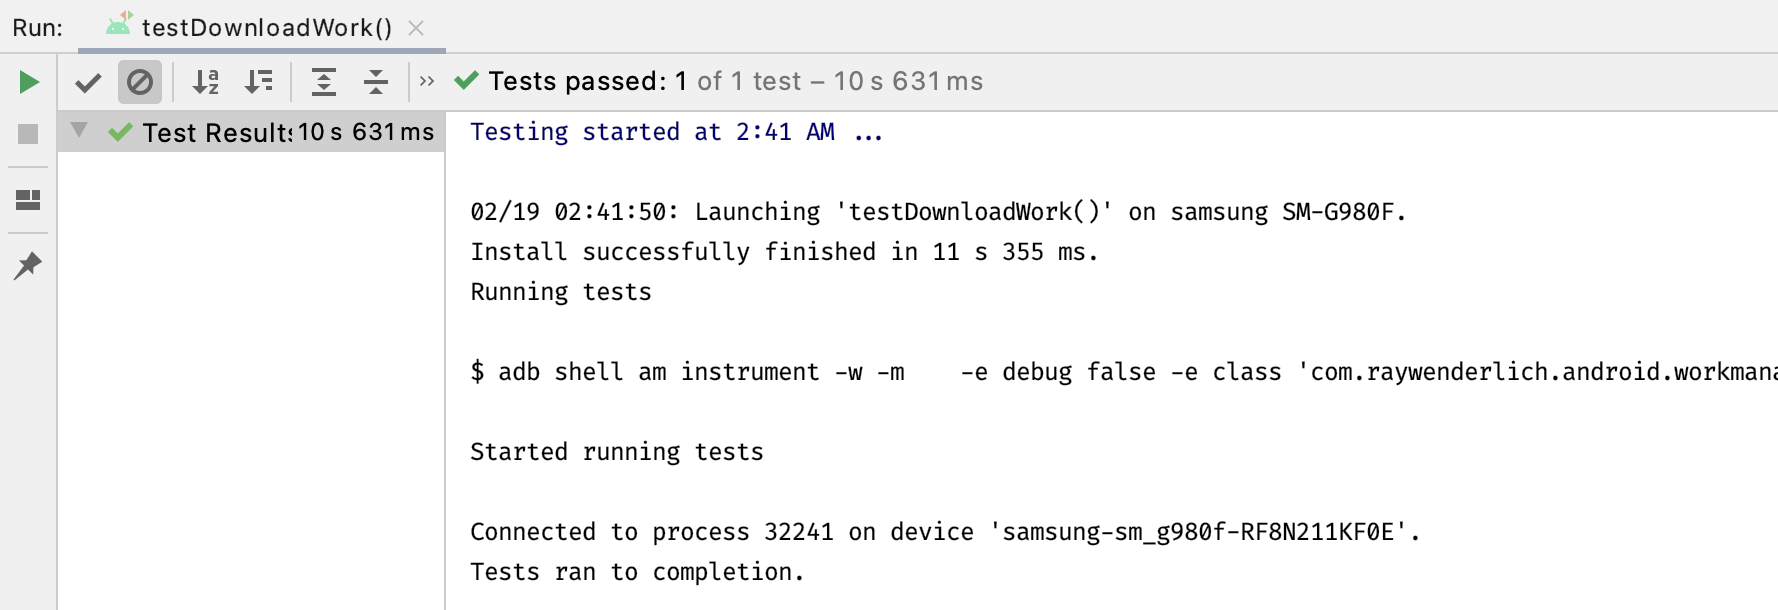 Image Download Worker Test